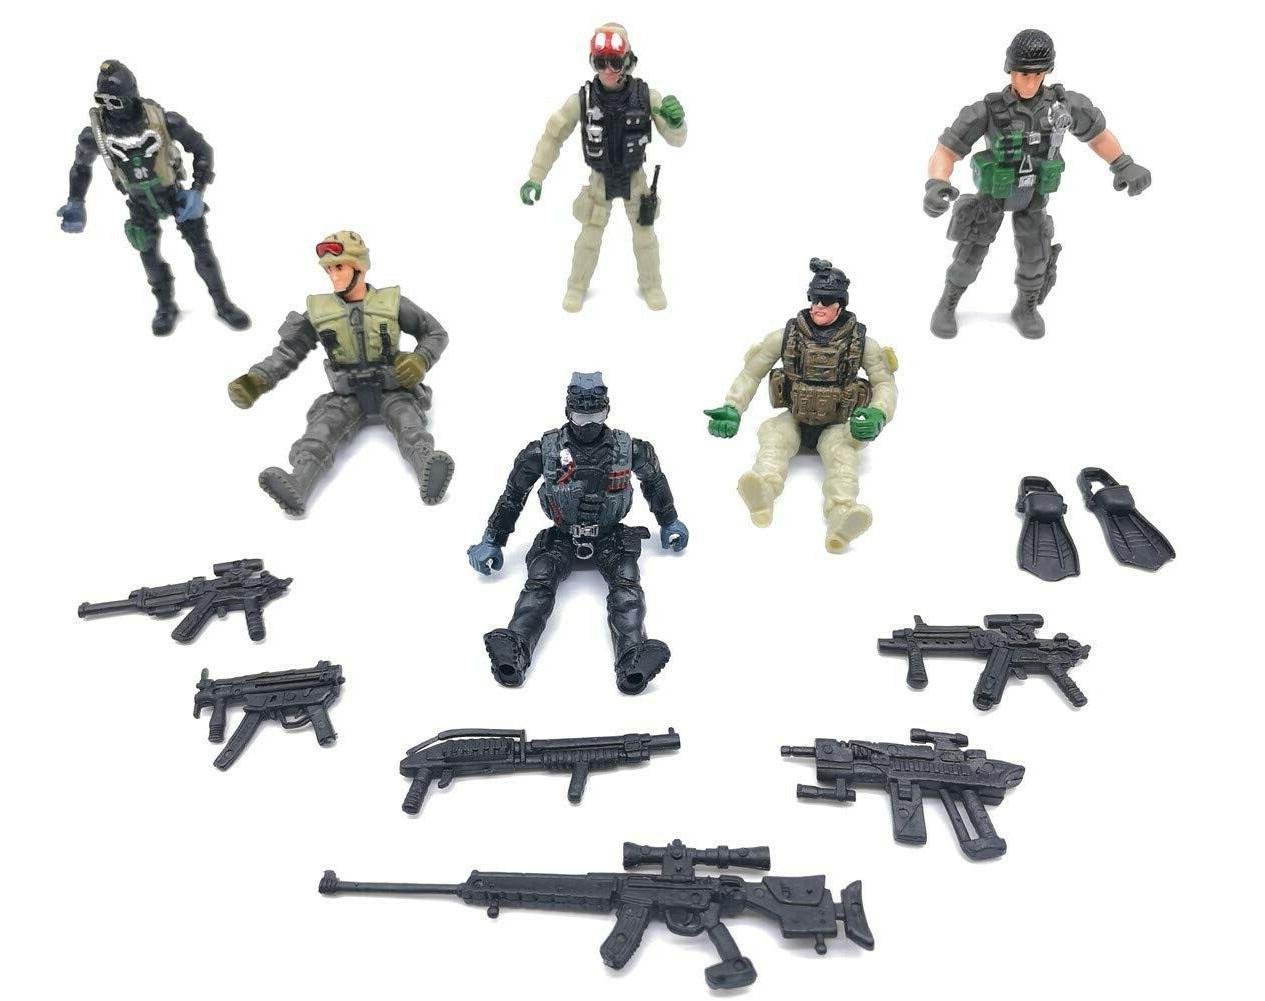 MilitarySpecial Force Marine Figure Elite Force Army